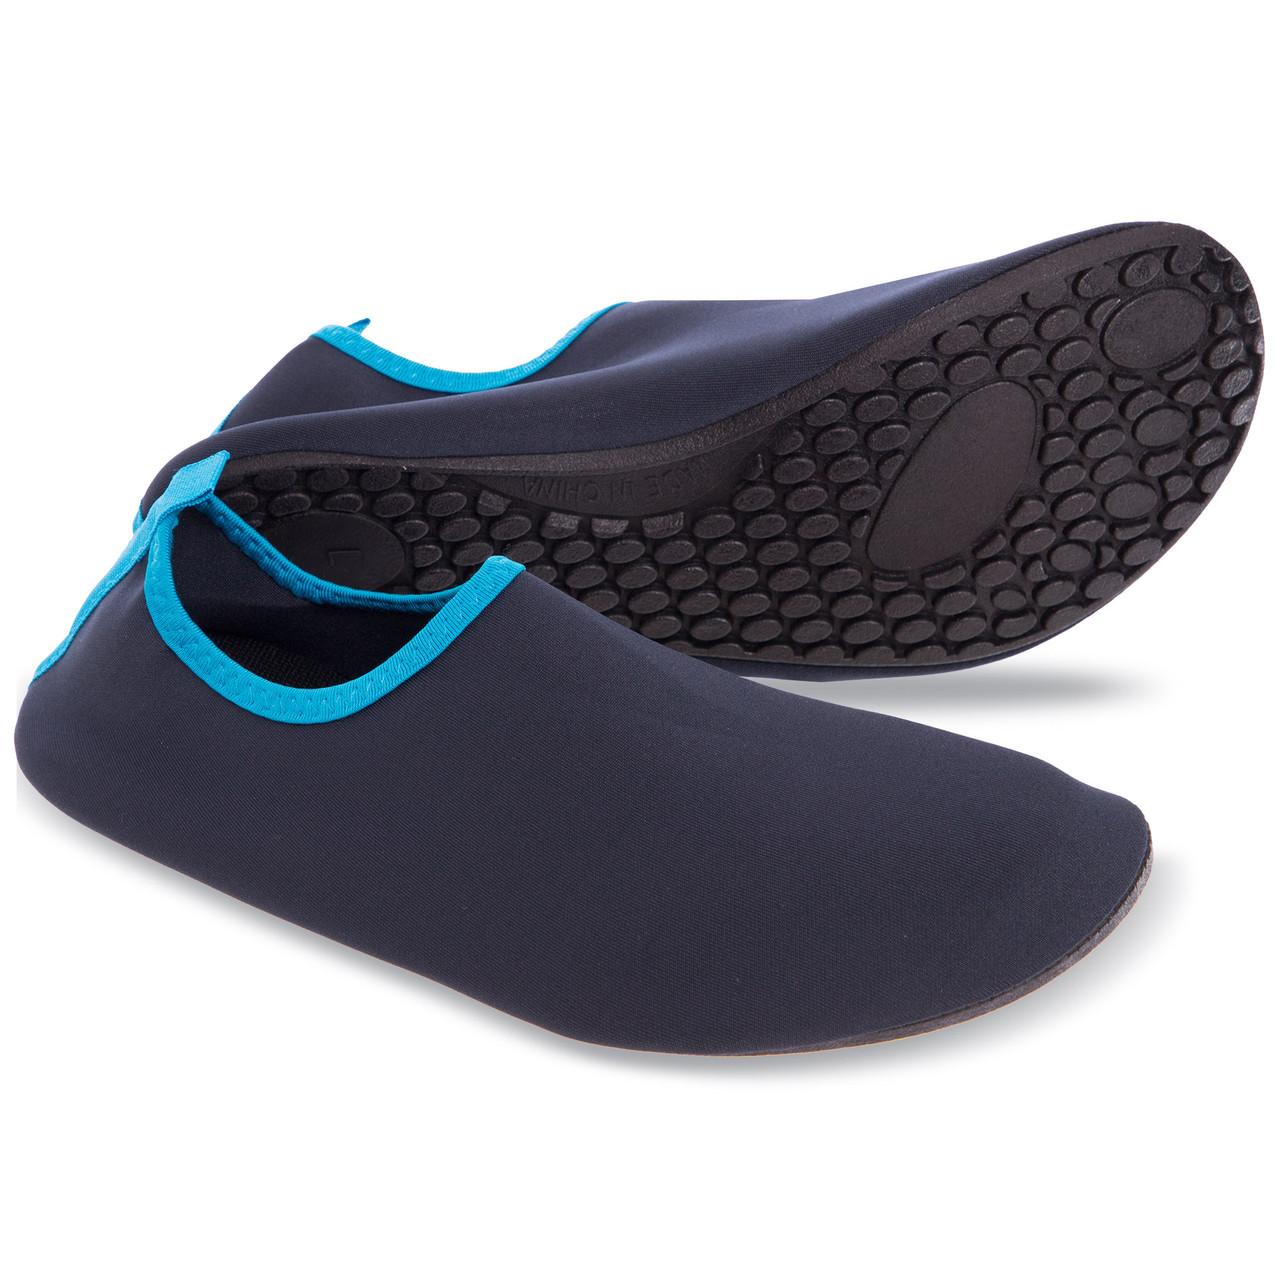 Обувь Skin Shoes для спорта и йоги темно-синяя PL-6962-B